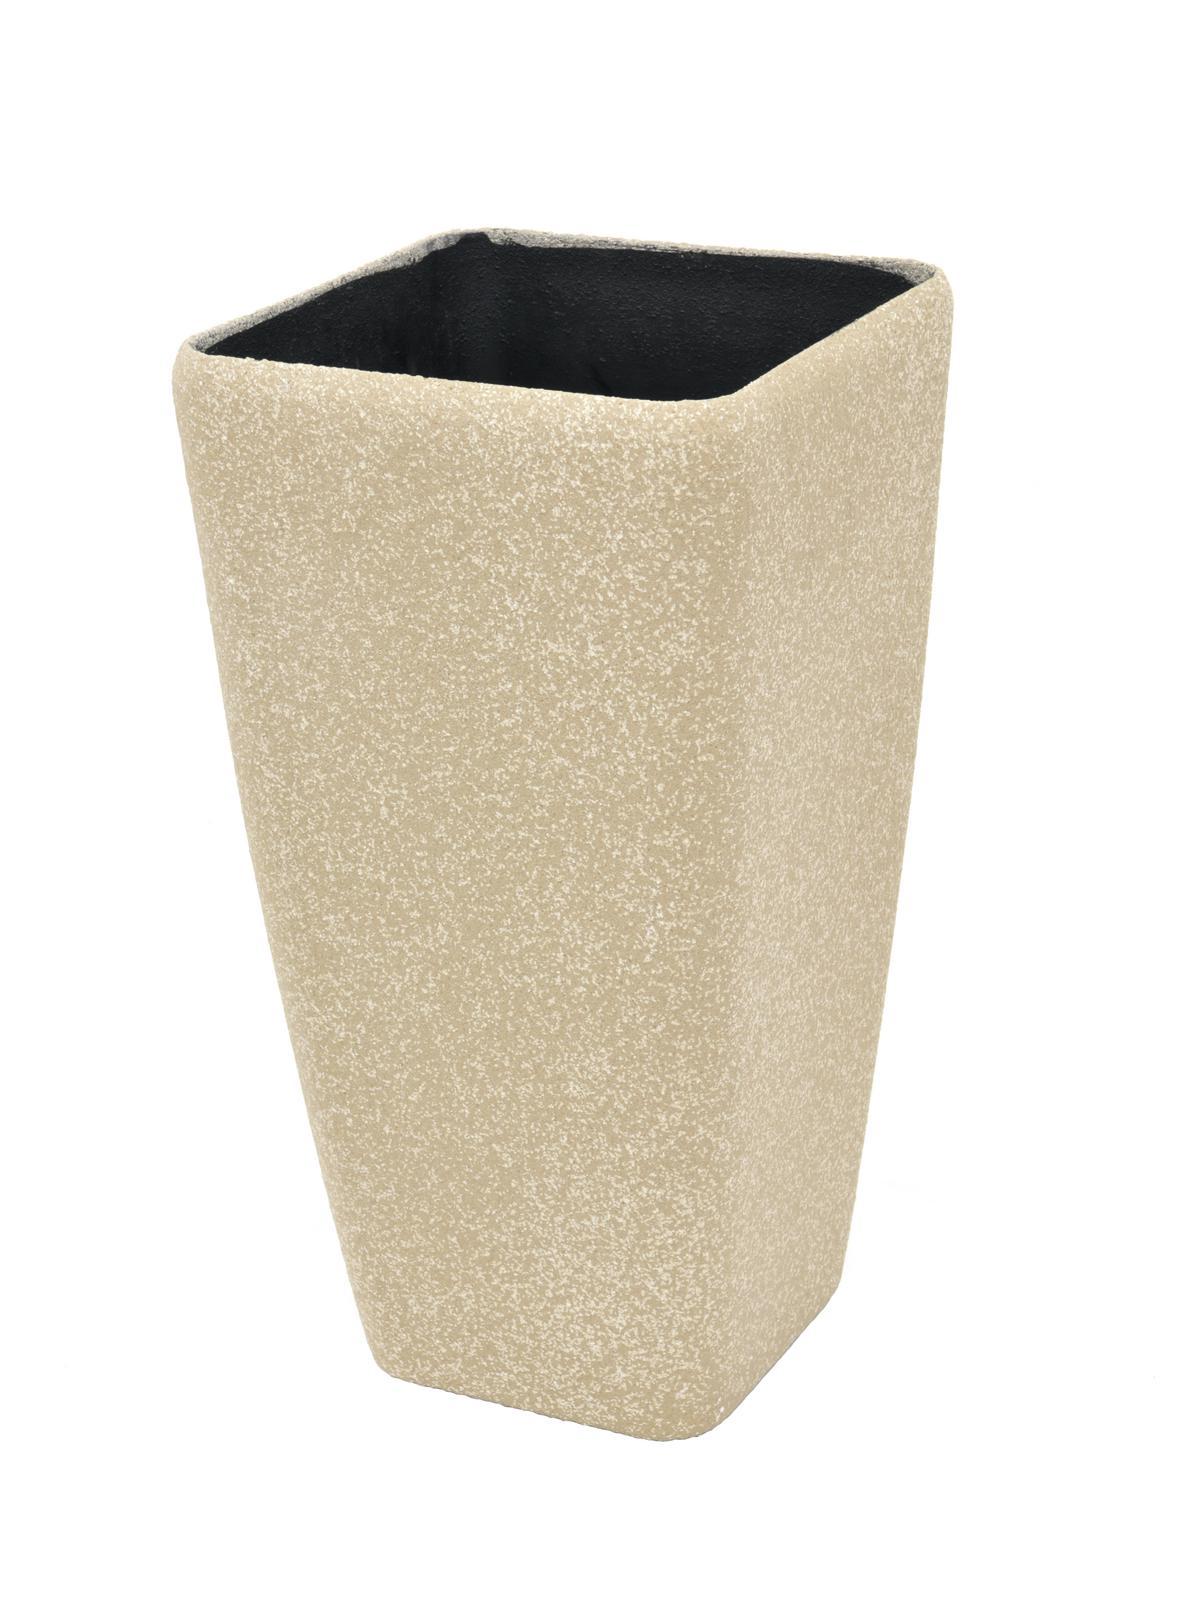 EUROPALMS Deco cachepot STONA-75, cubi, beige